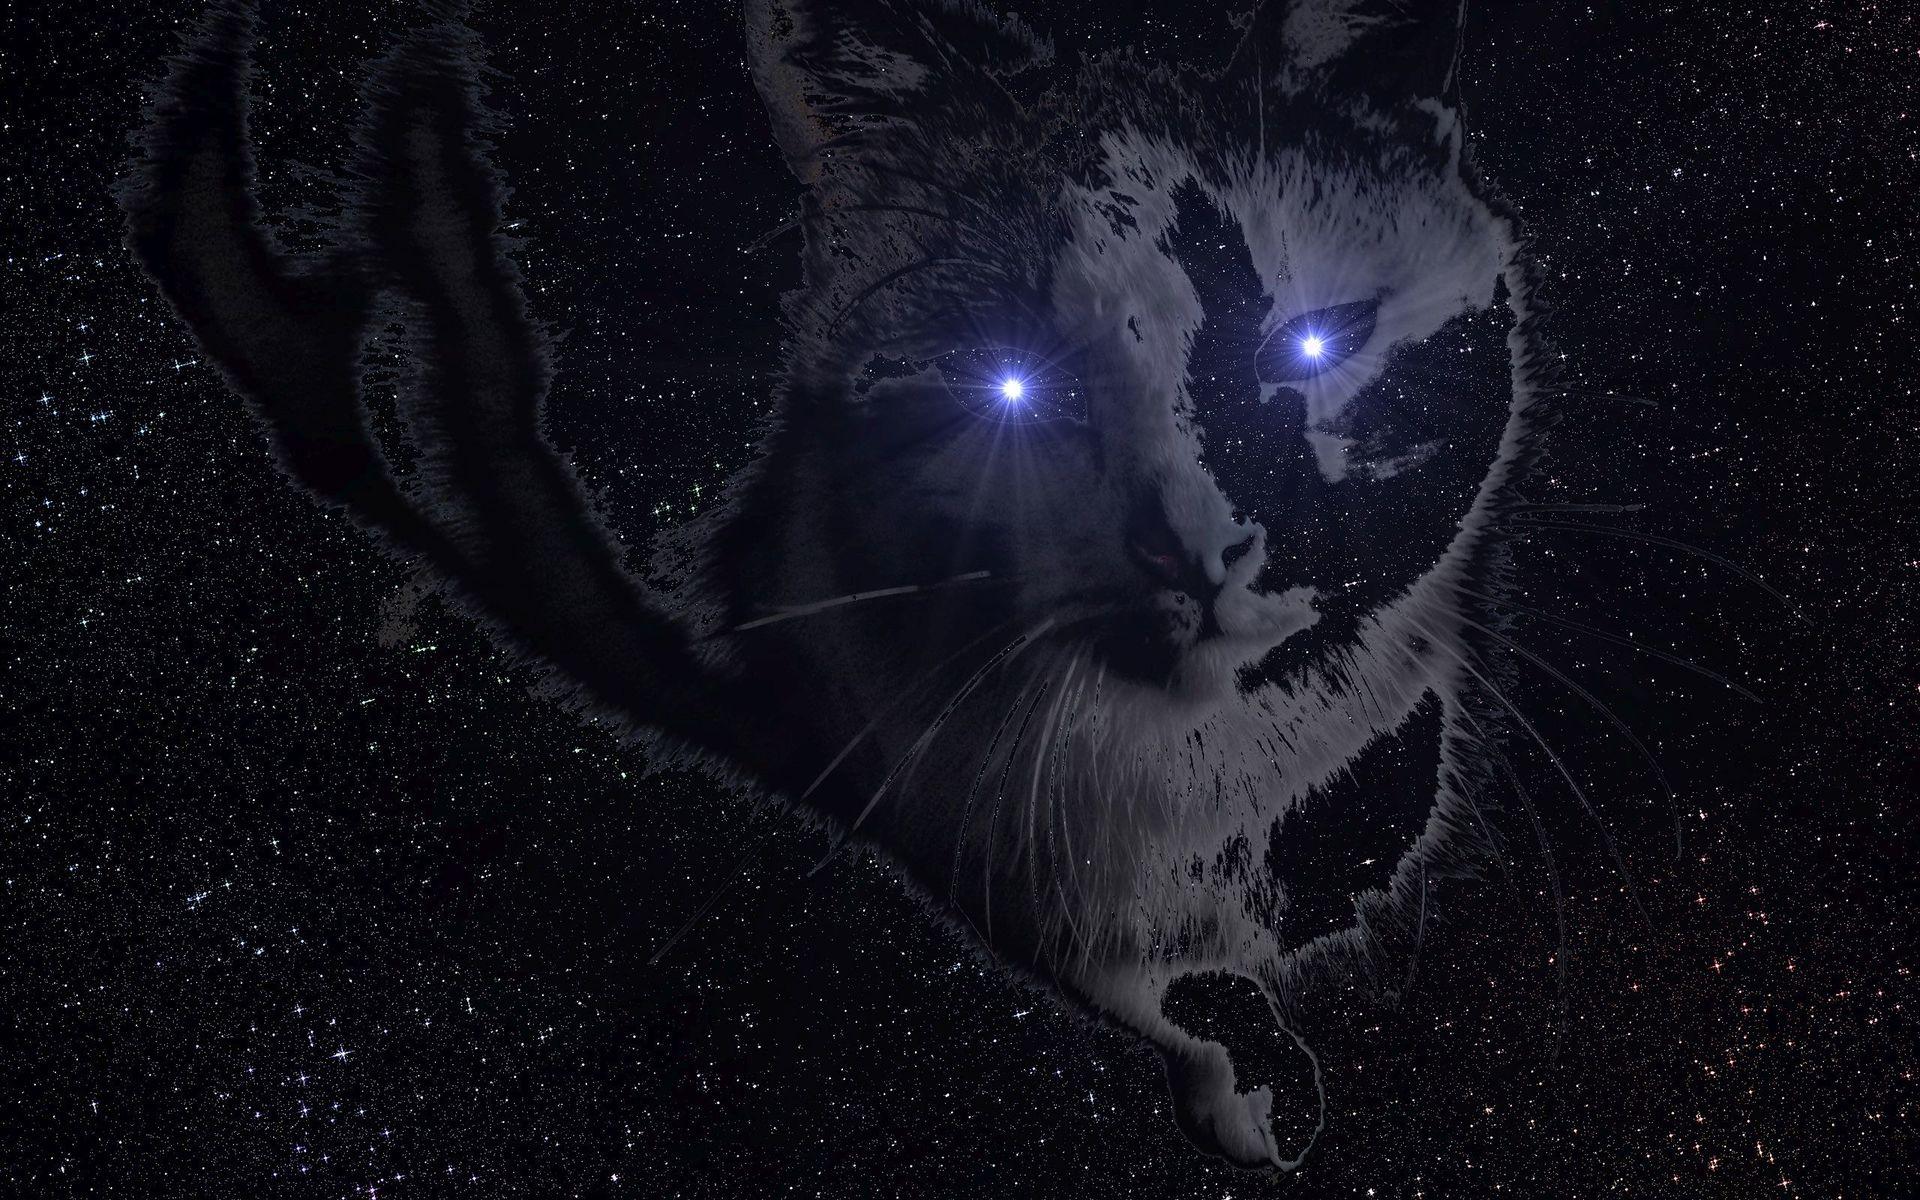 Space cat Wallpaper 39626 1920x1200